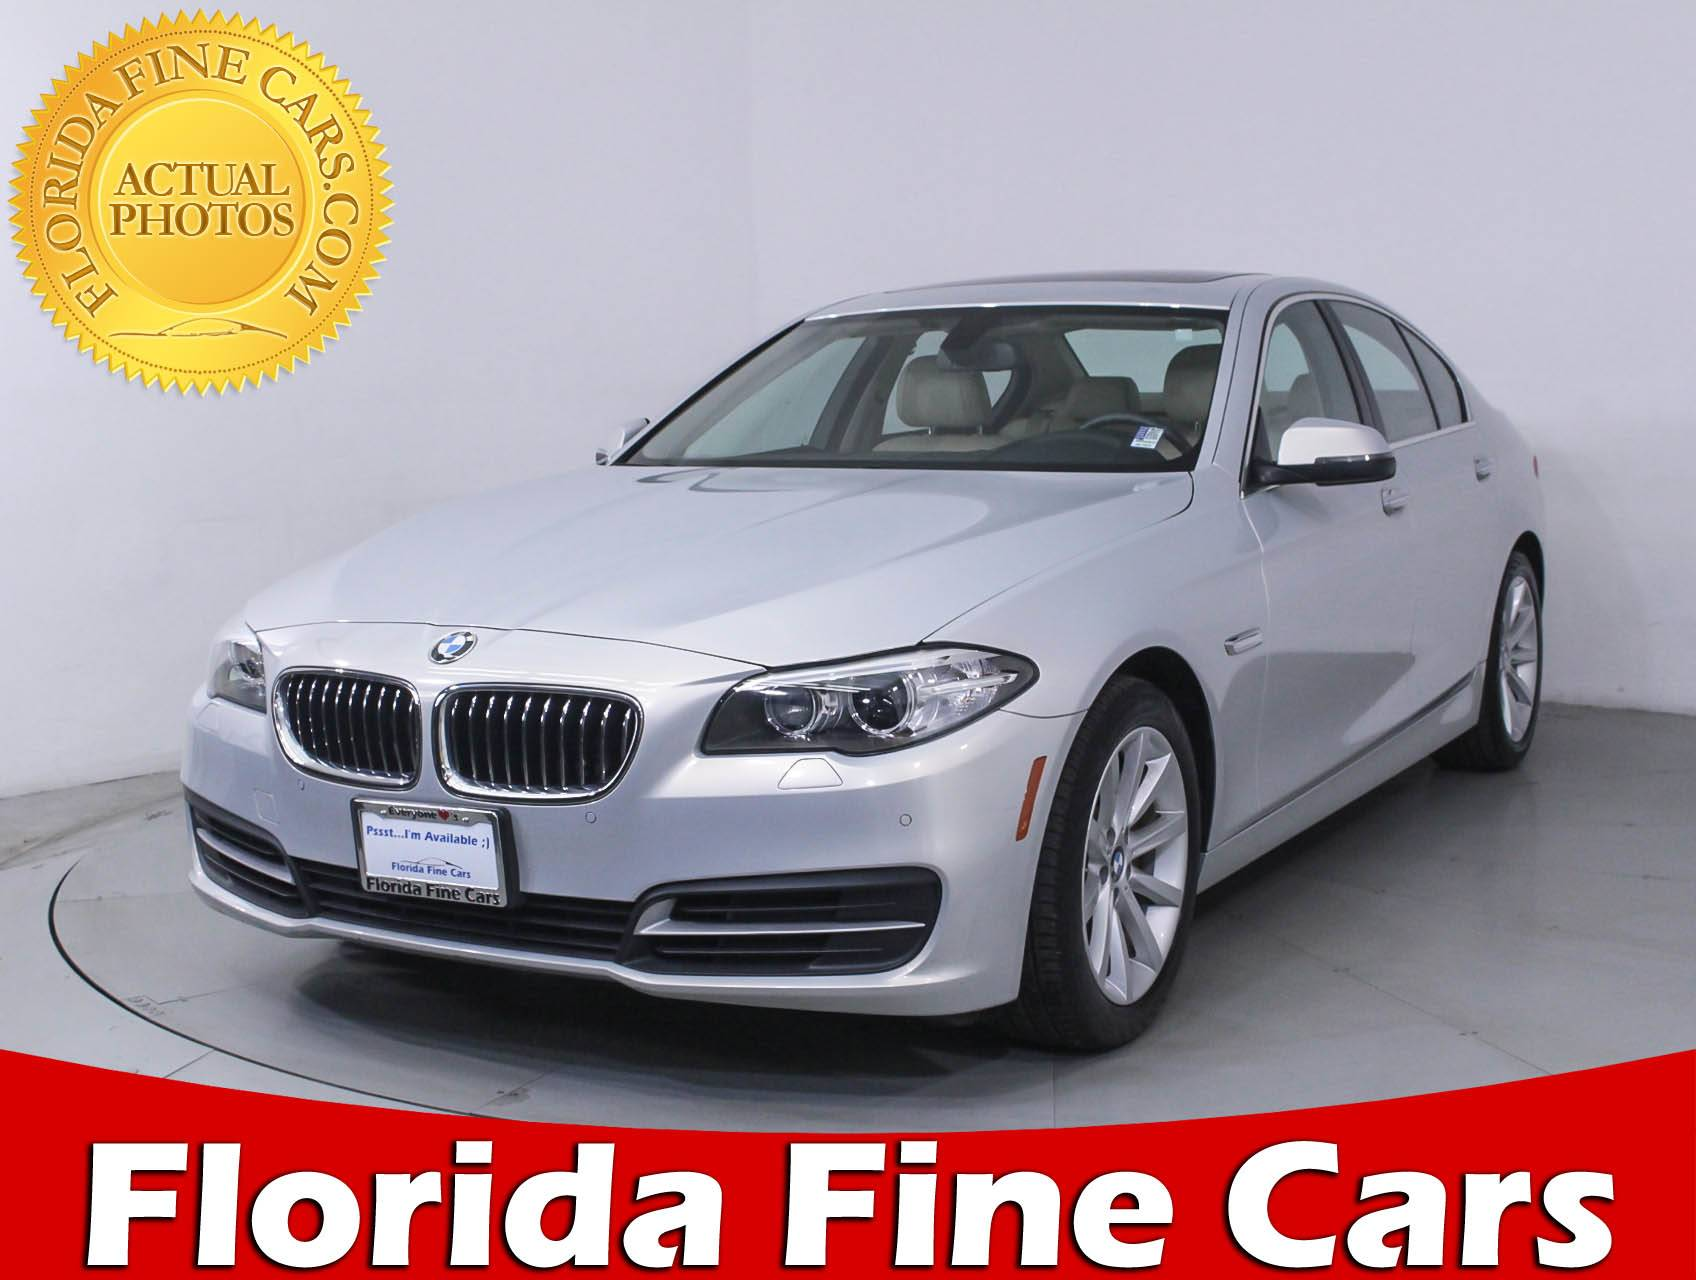 Used 2014 BMW 5 SERIES 535I XDRIVE Sedan for sale in HOLLYWOOD FL